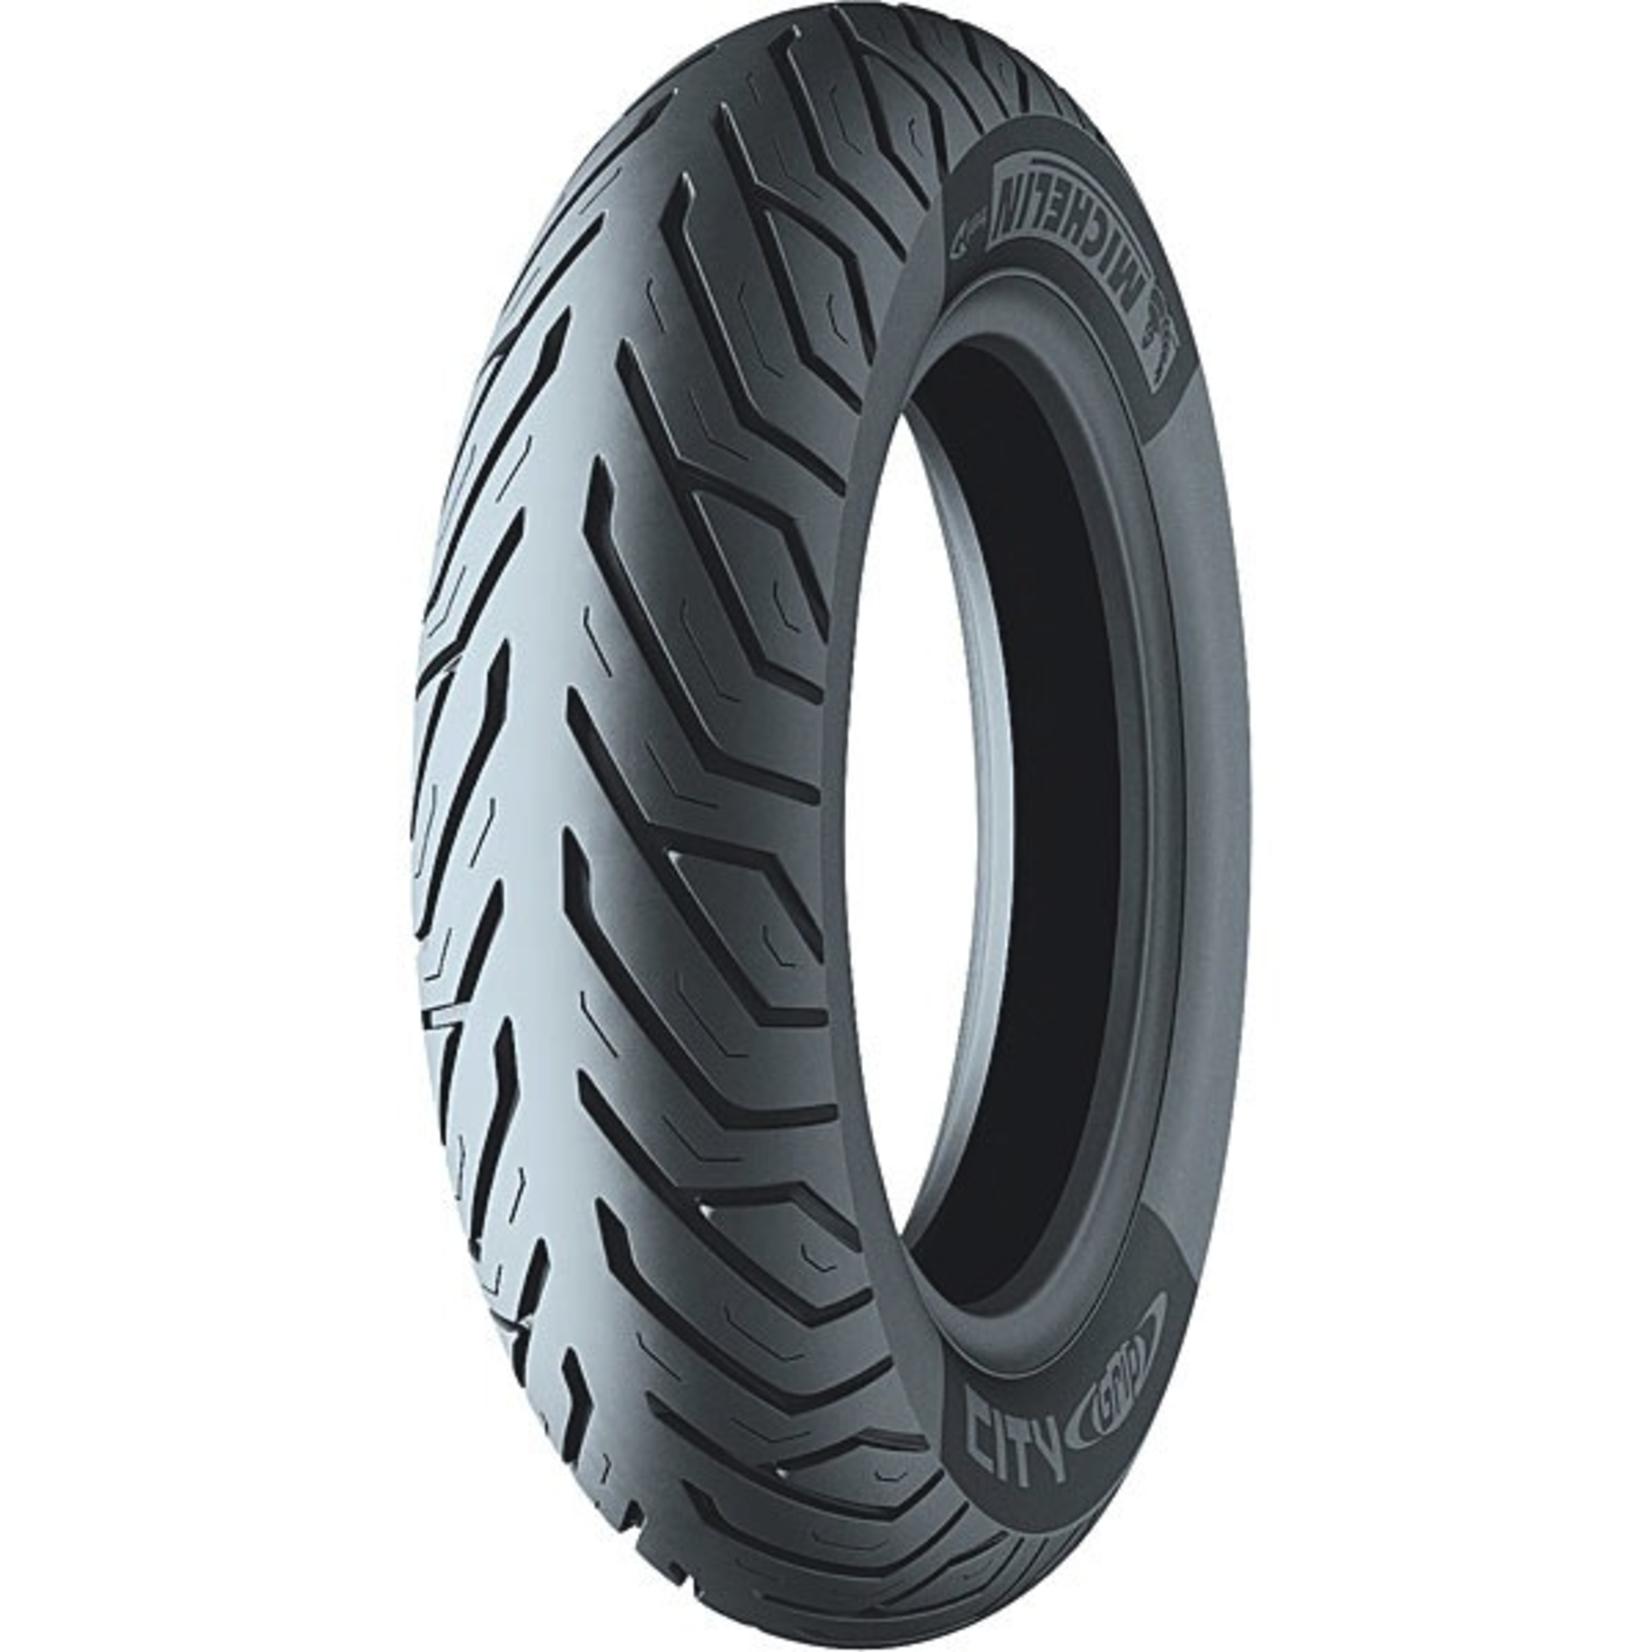 "Parts Tire, 120/70-11"" Michelin City Grip (Rear)"